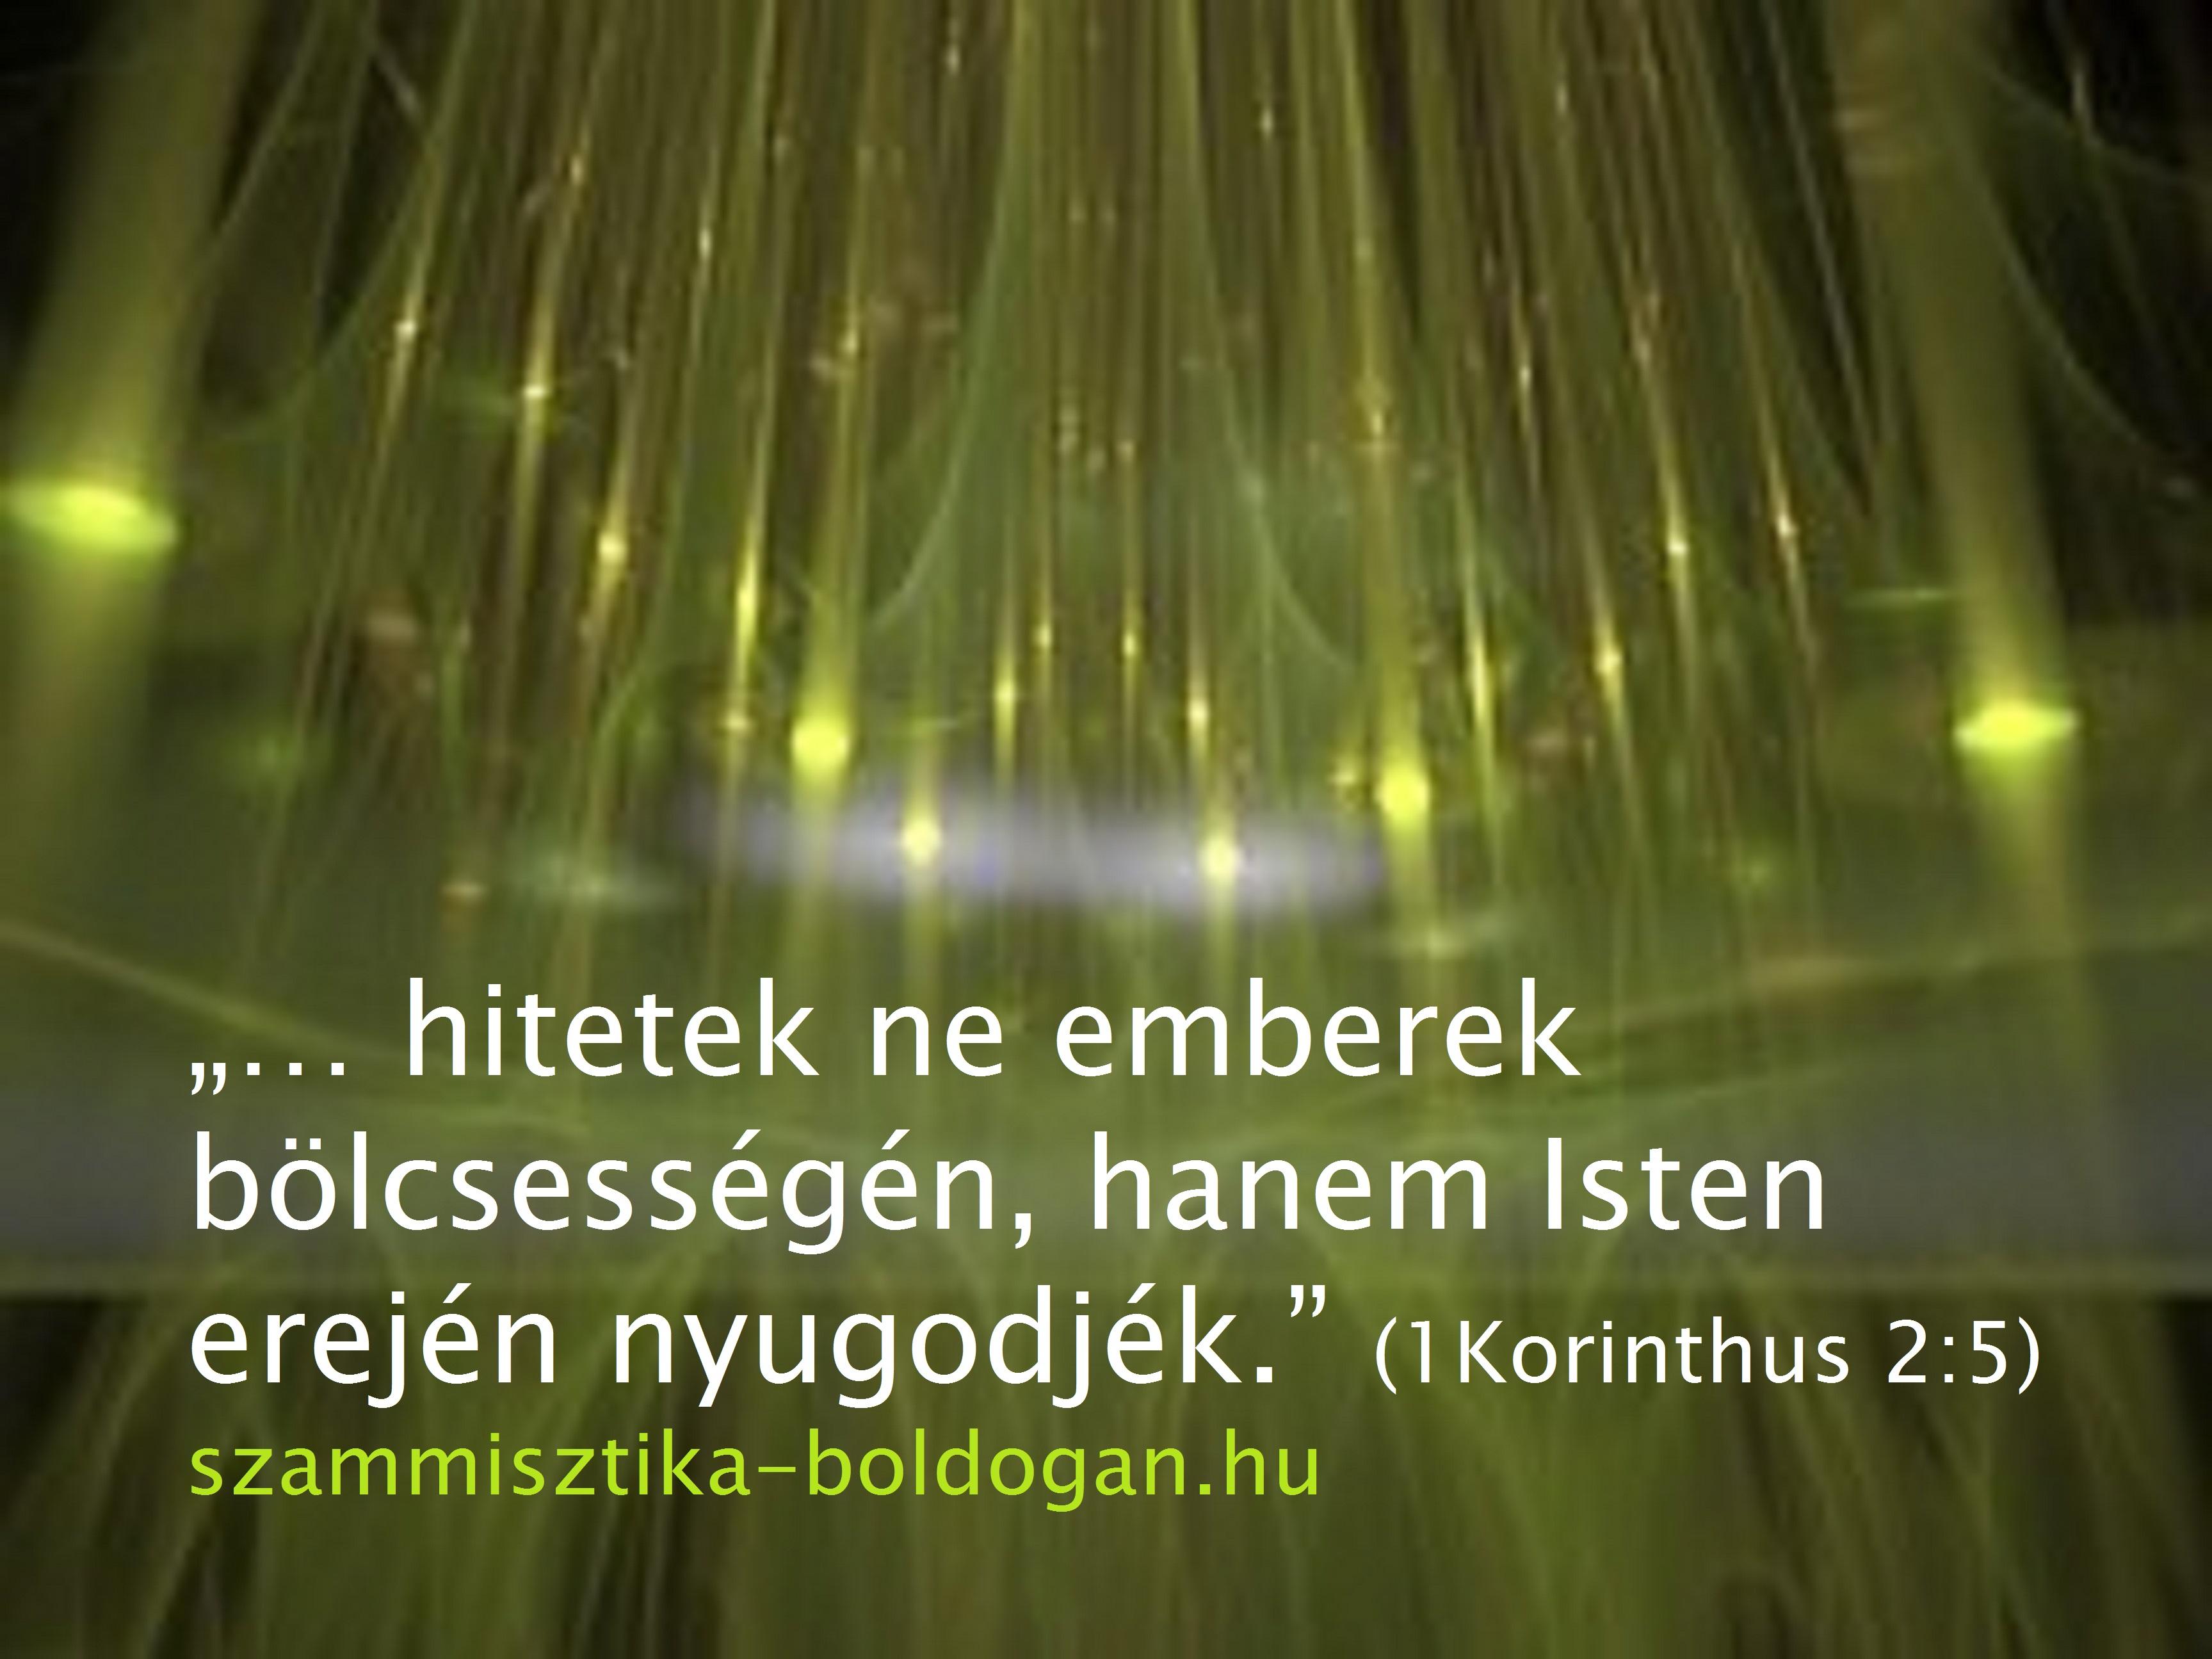 Isten, hit idézet